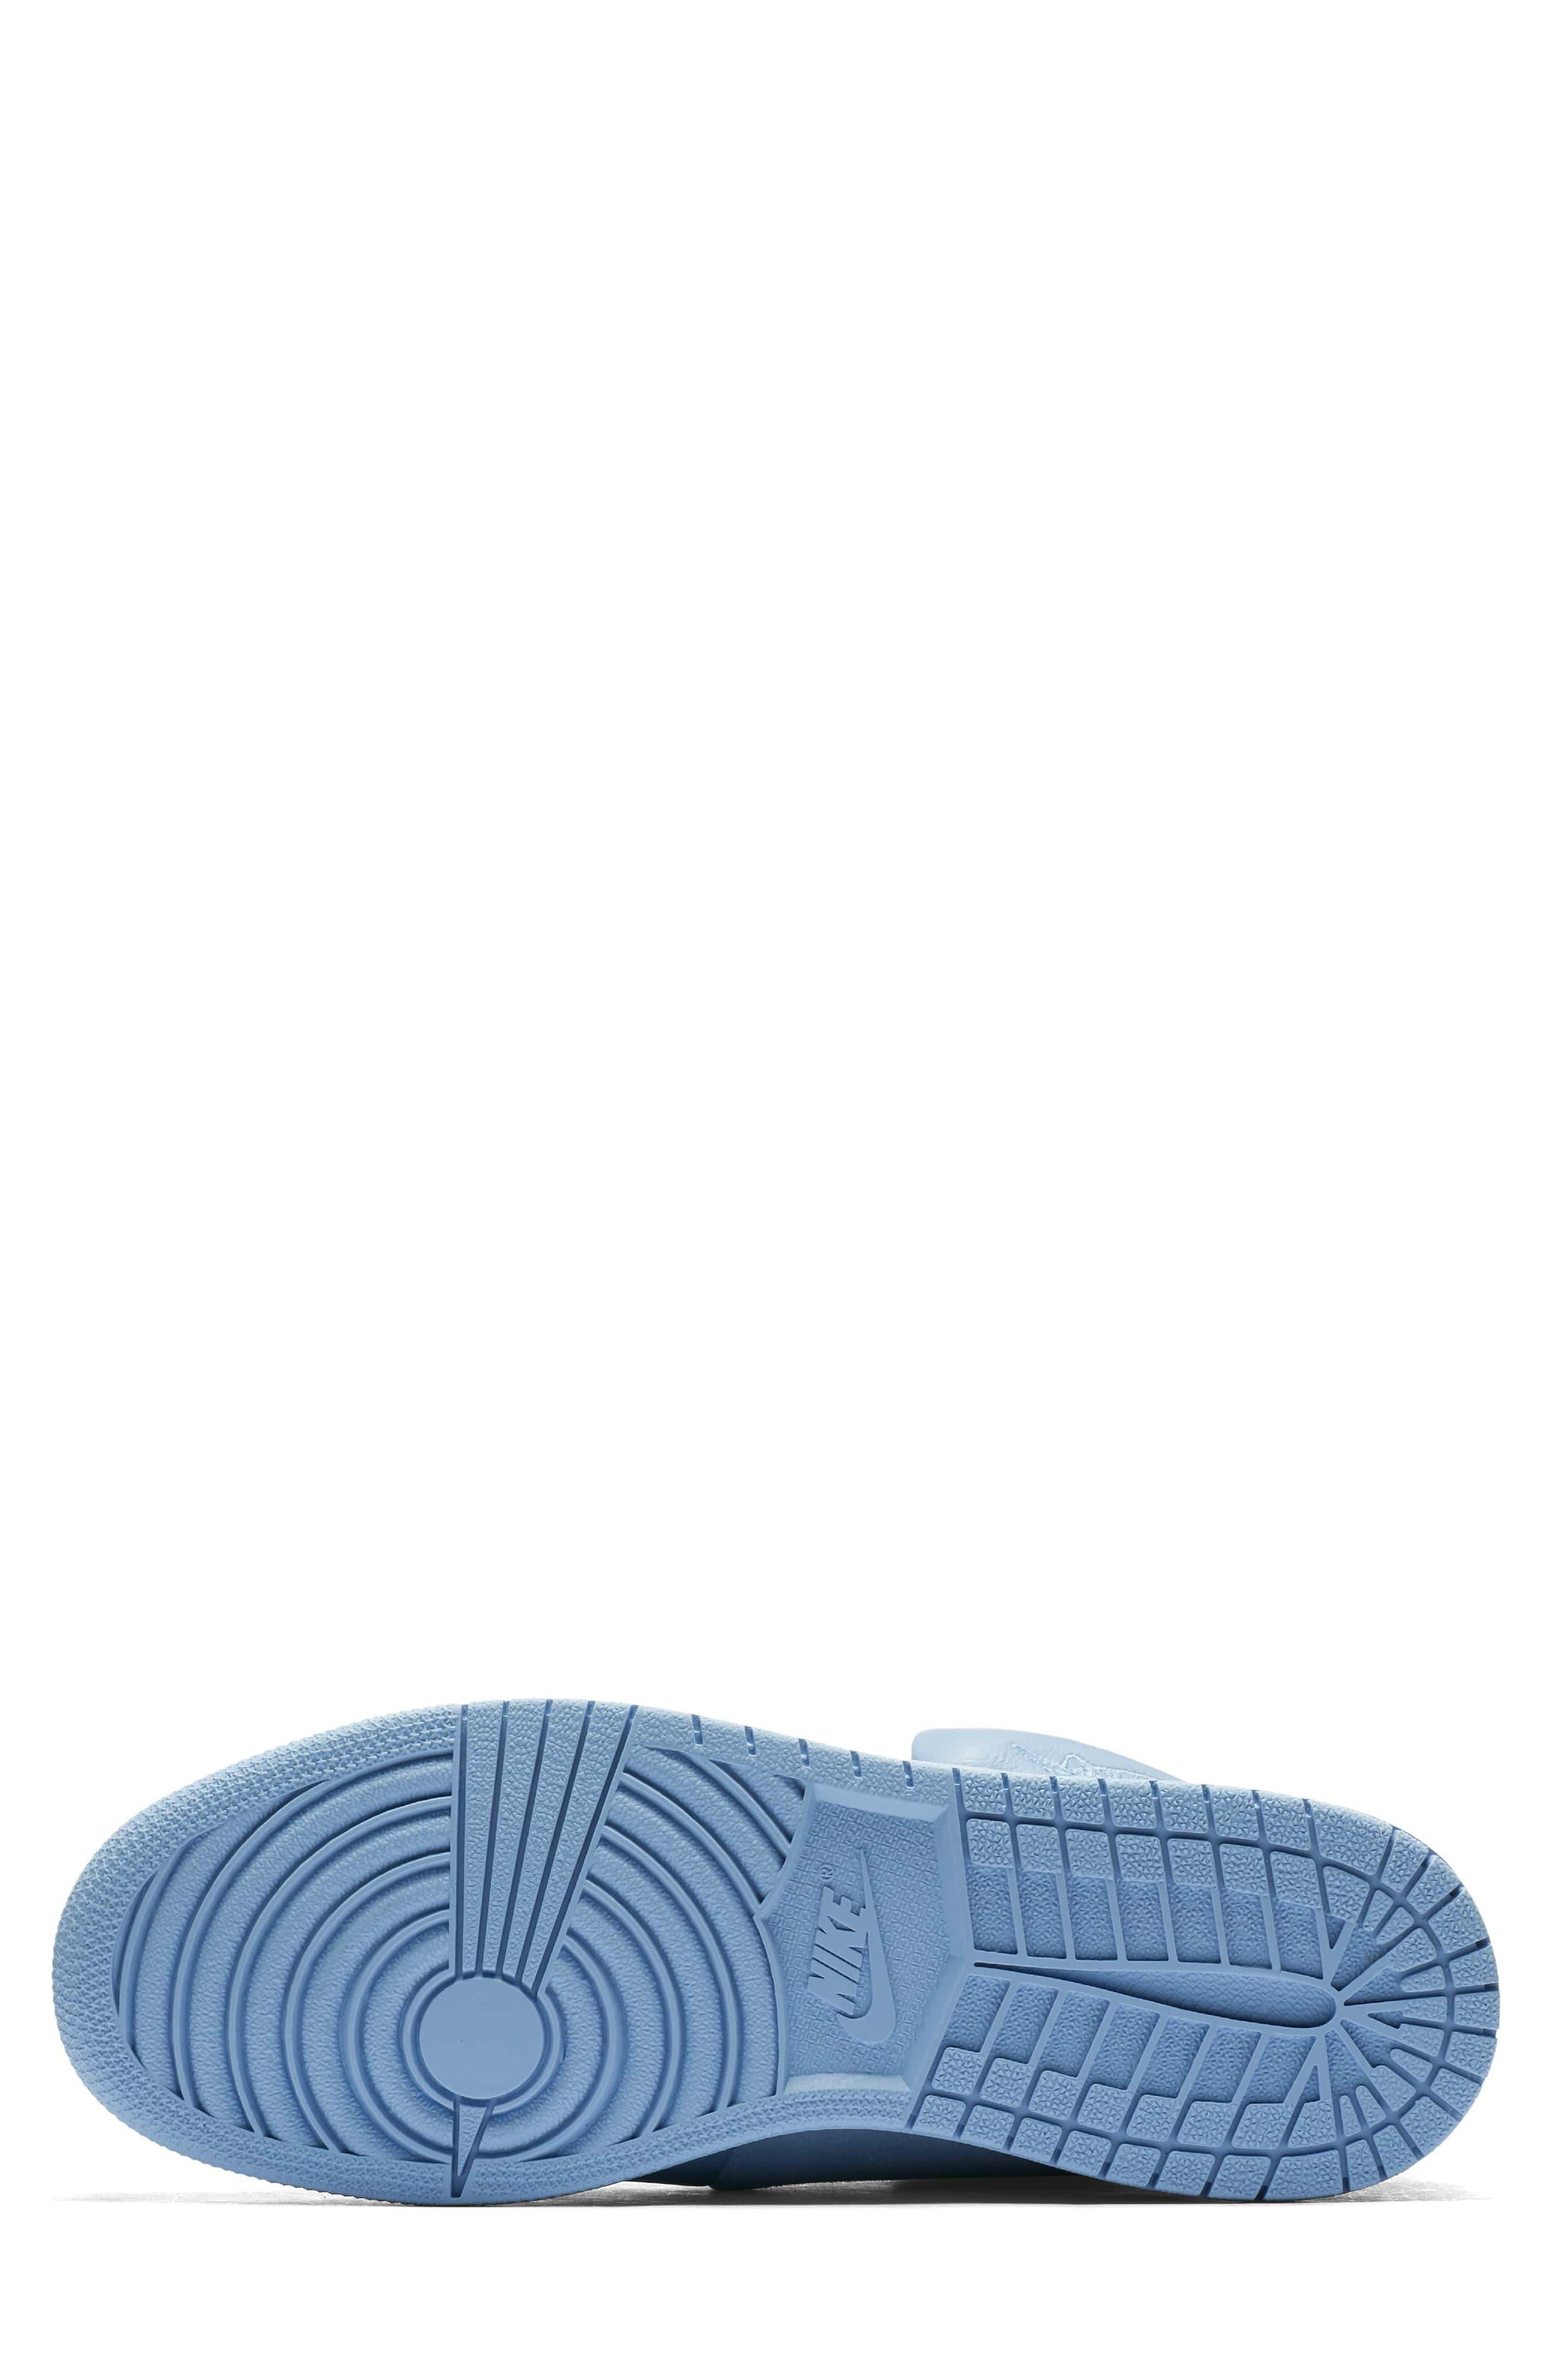 Air Jordan 1 Sage XX High Top Sneaker,                             Alternate thumbnail 5, color,                             Light Blue